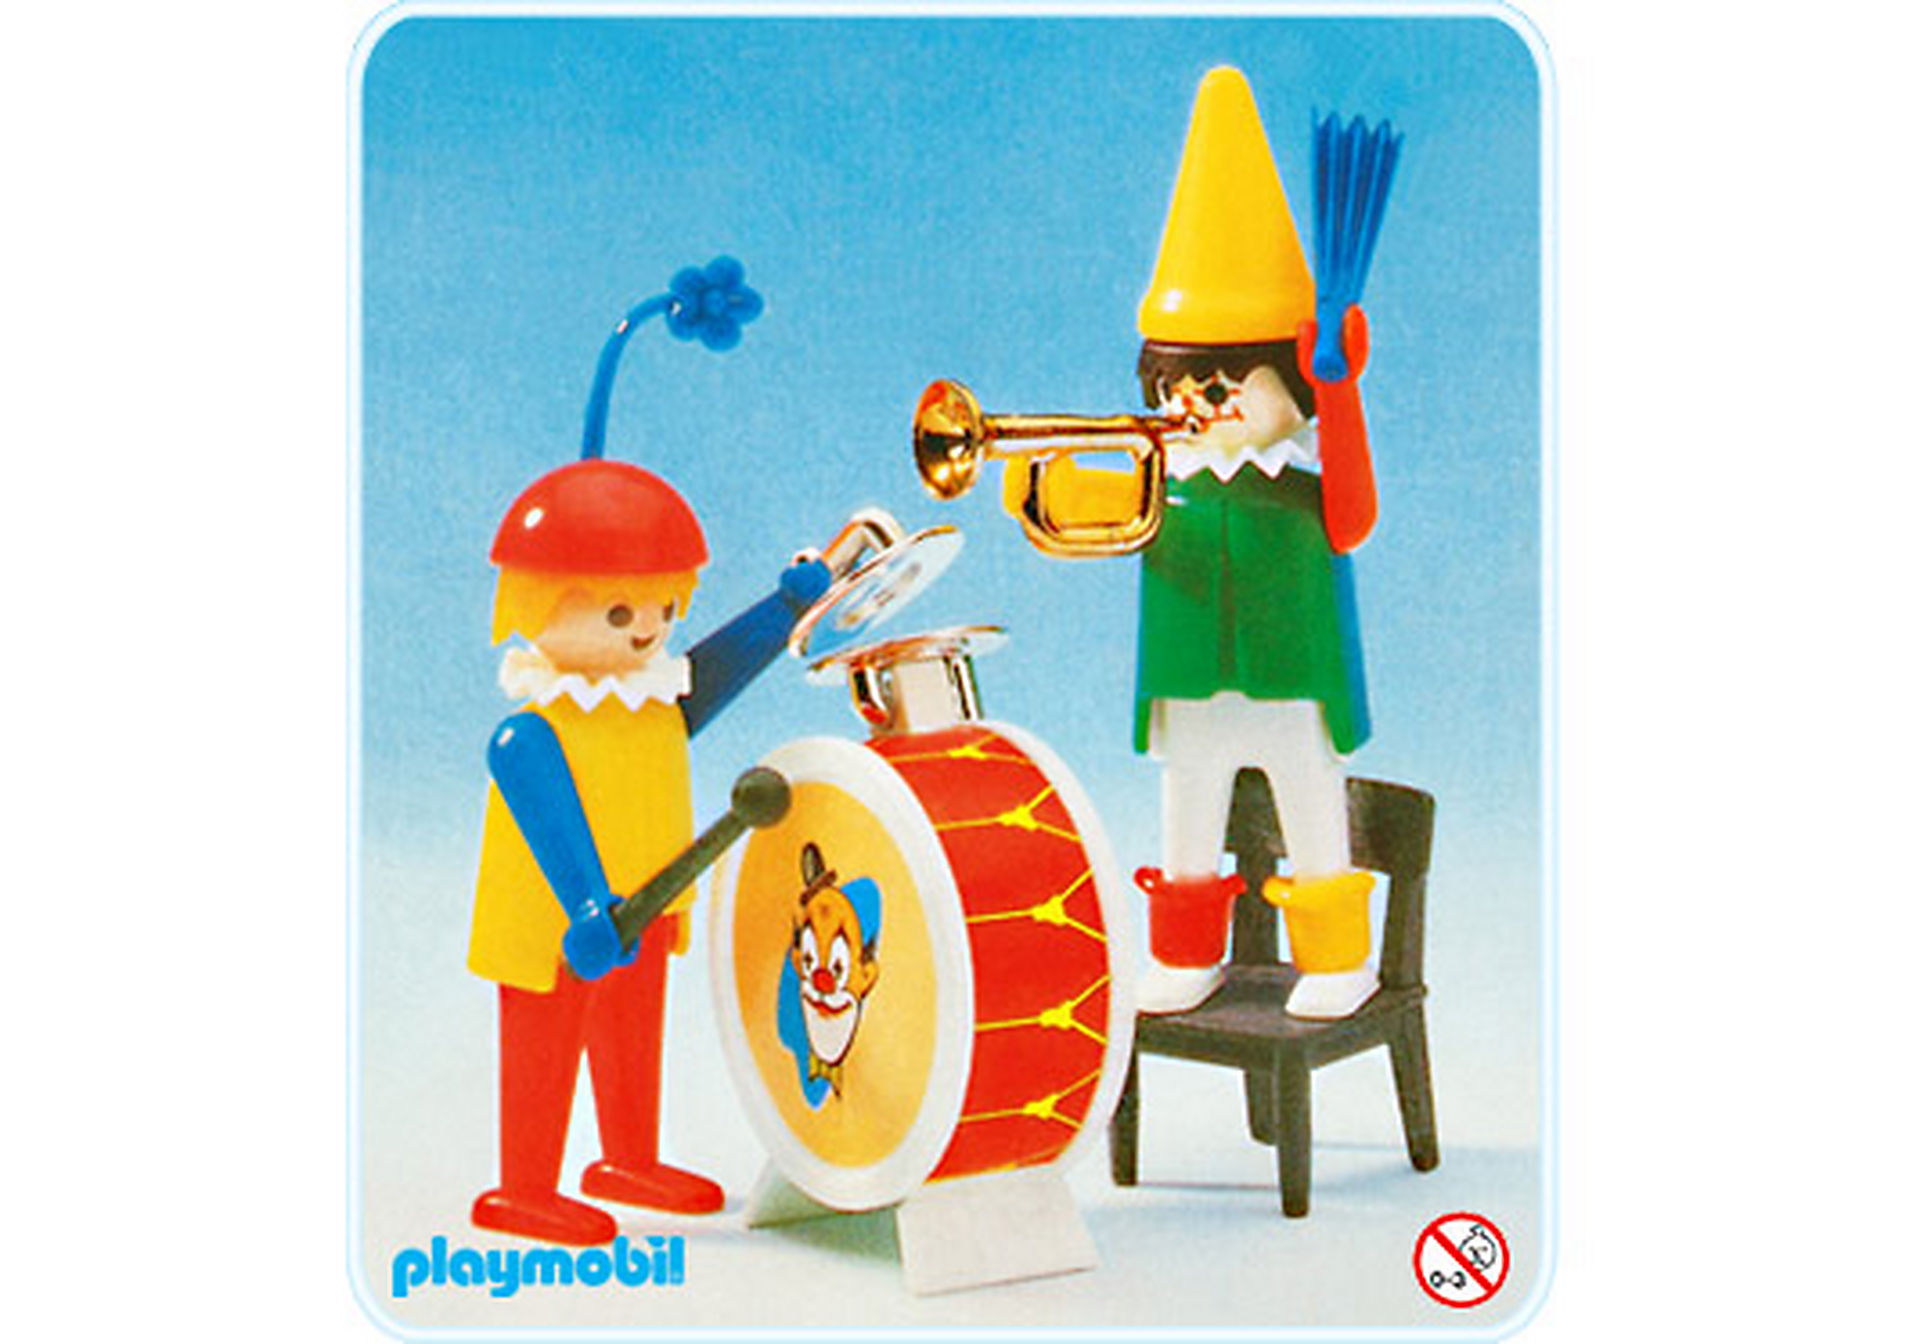 http://media.playmobil.com/i/playmobil/3578-A_product_detail/Musik-Clowns